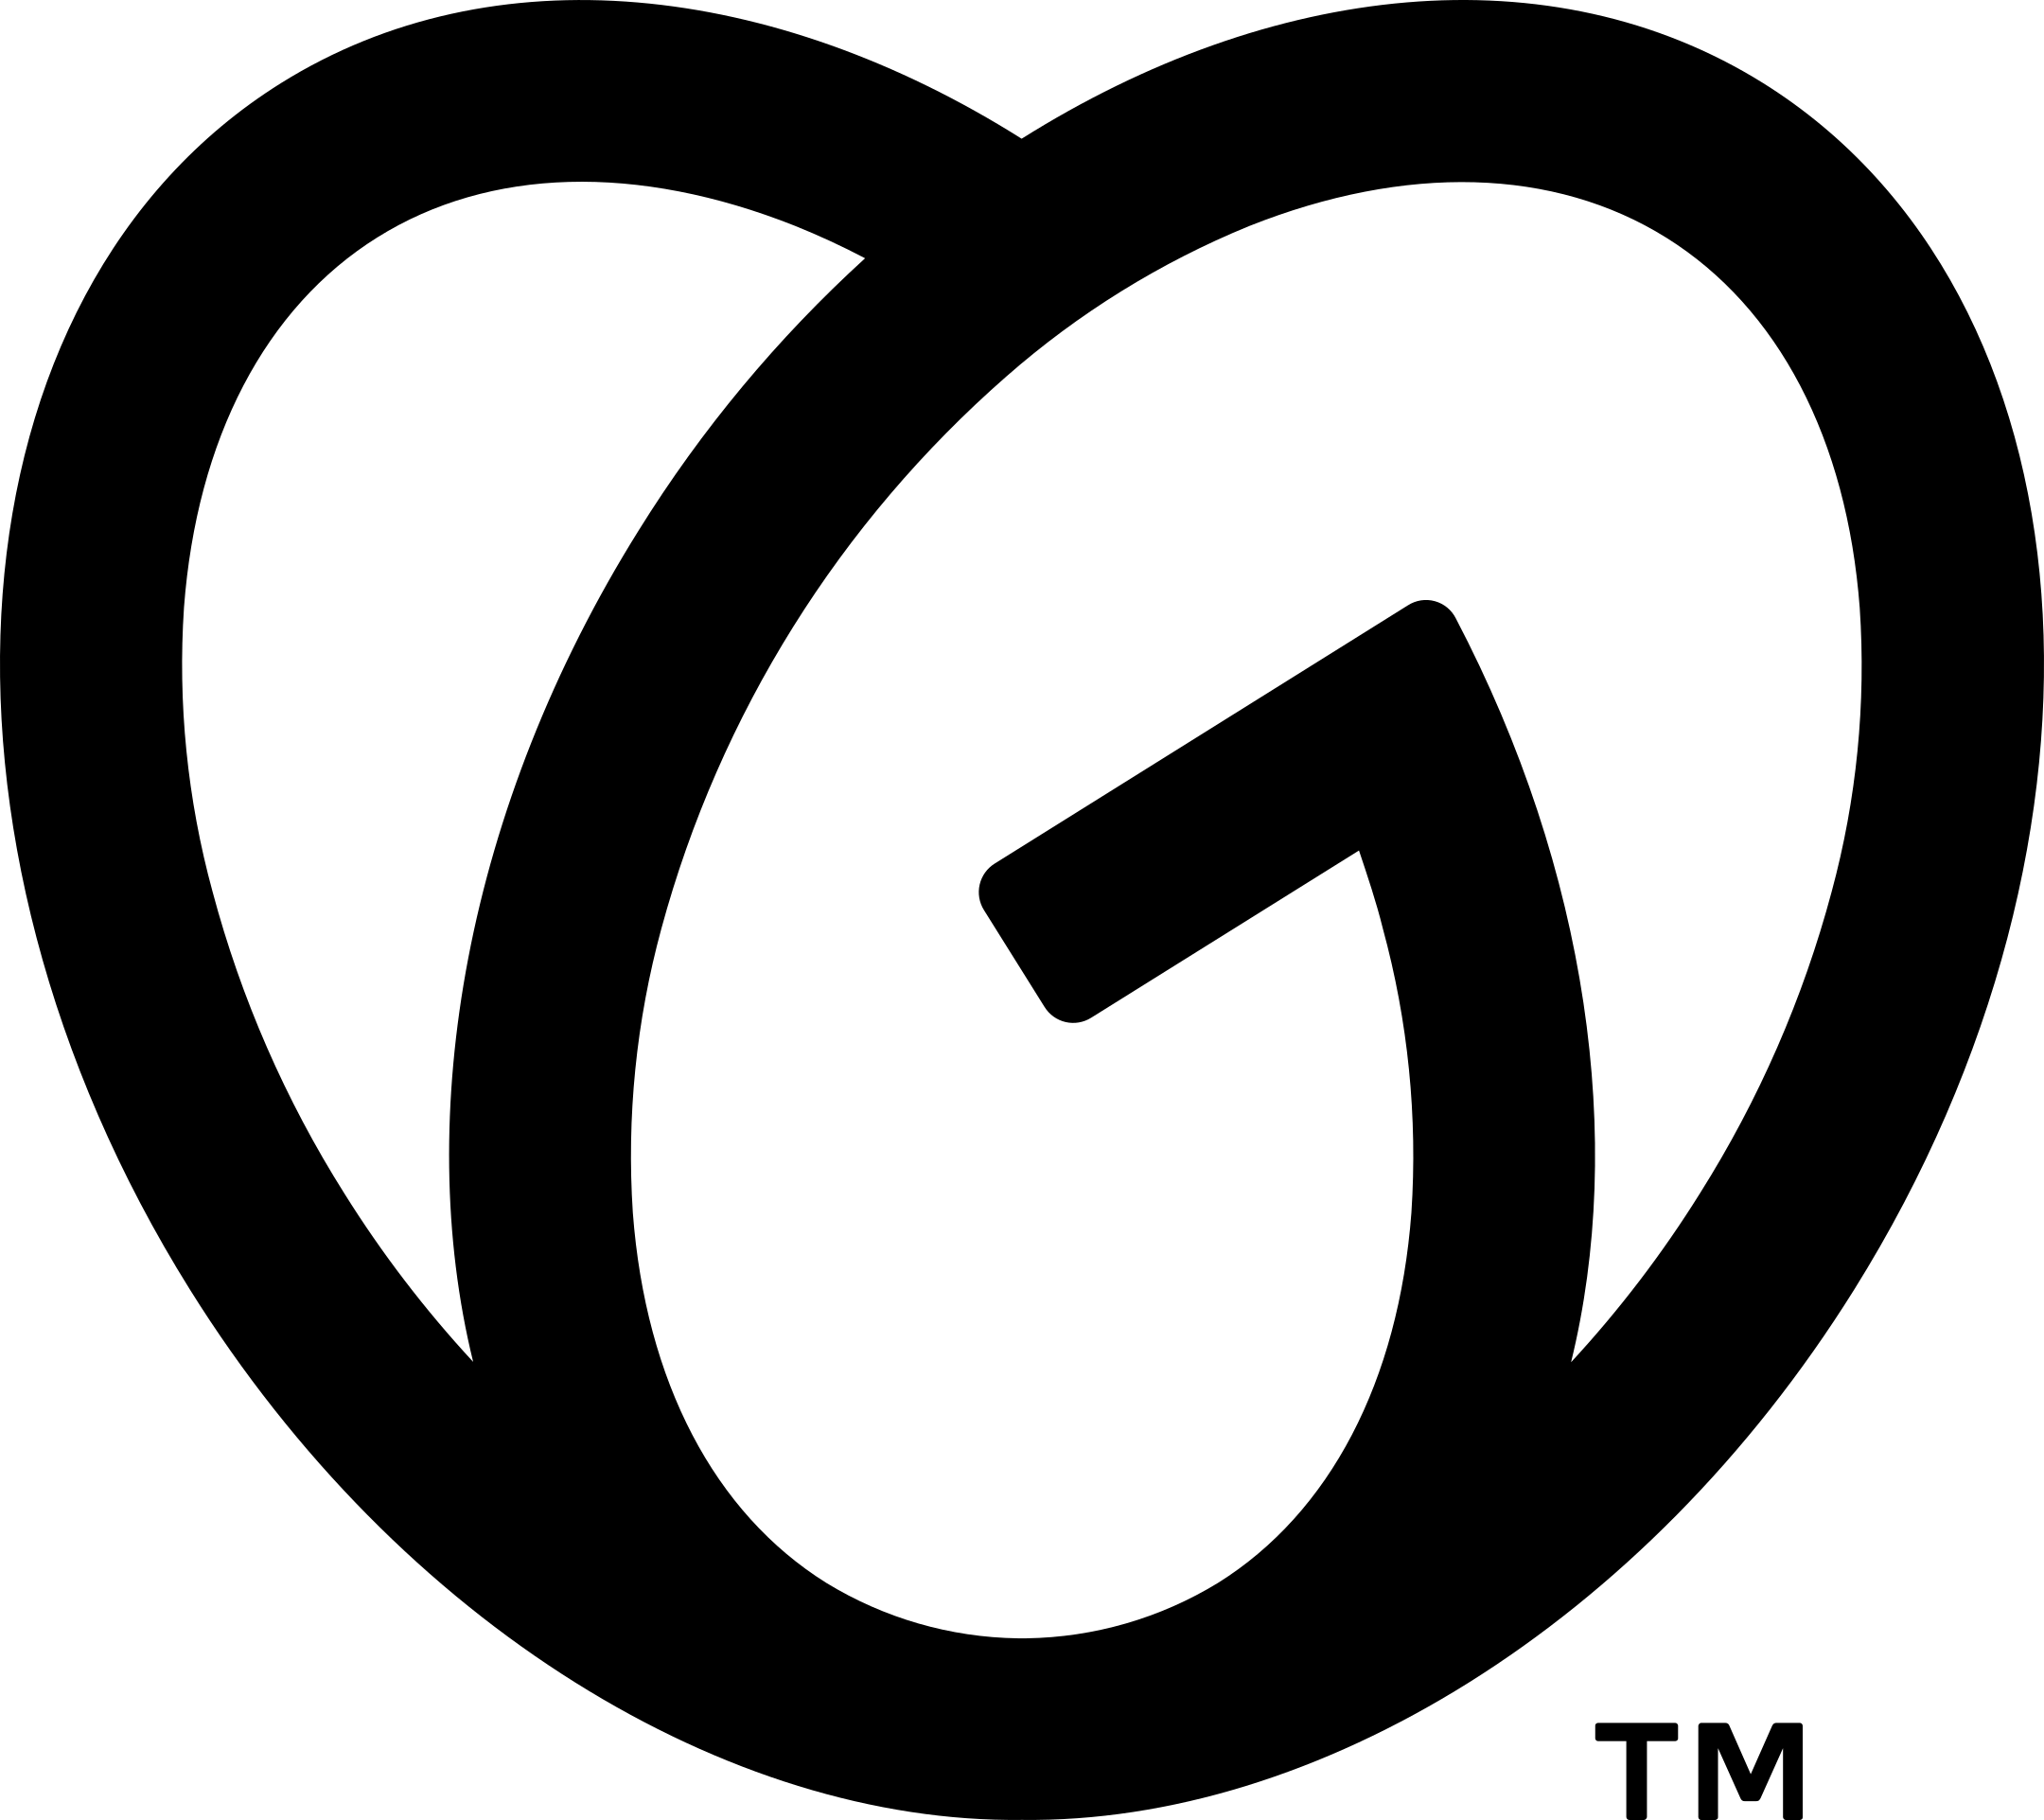 godaddy logo 5 1 - Godaddy Logo